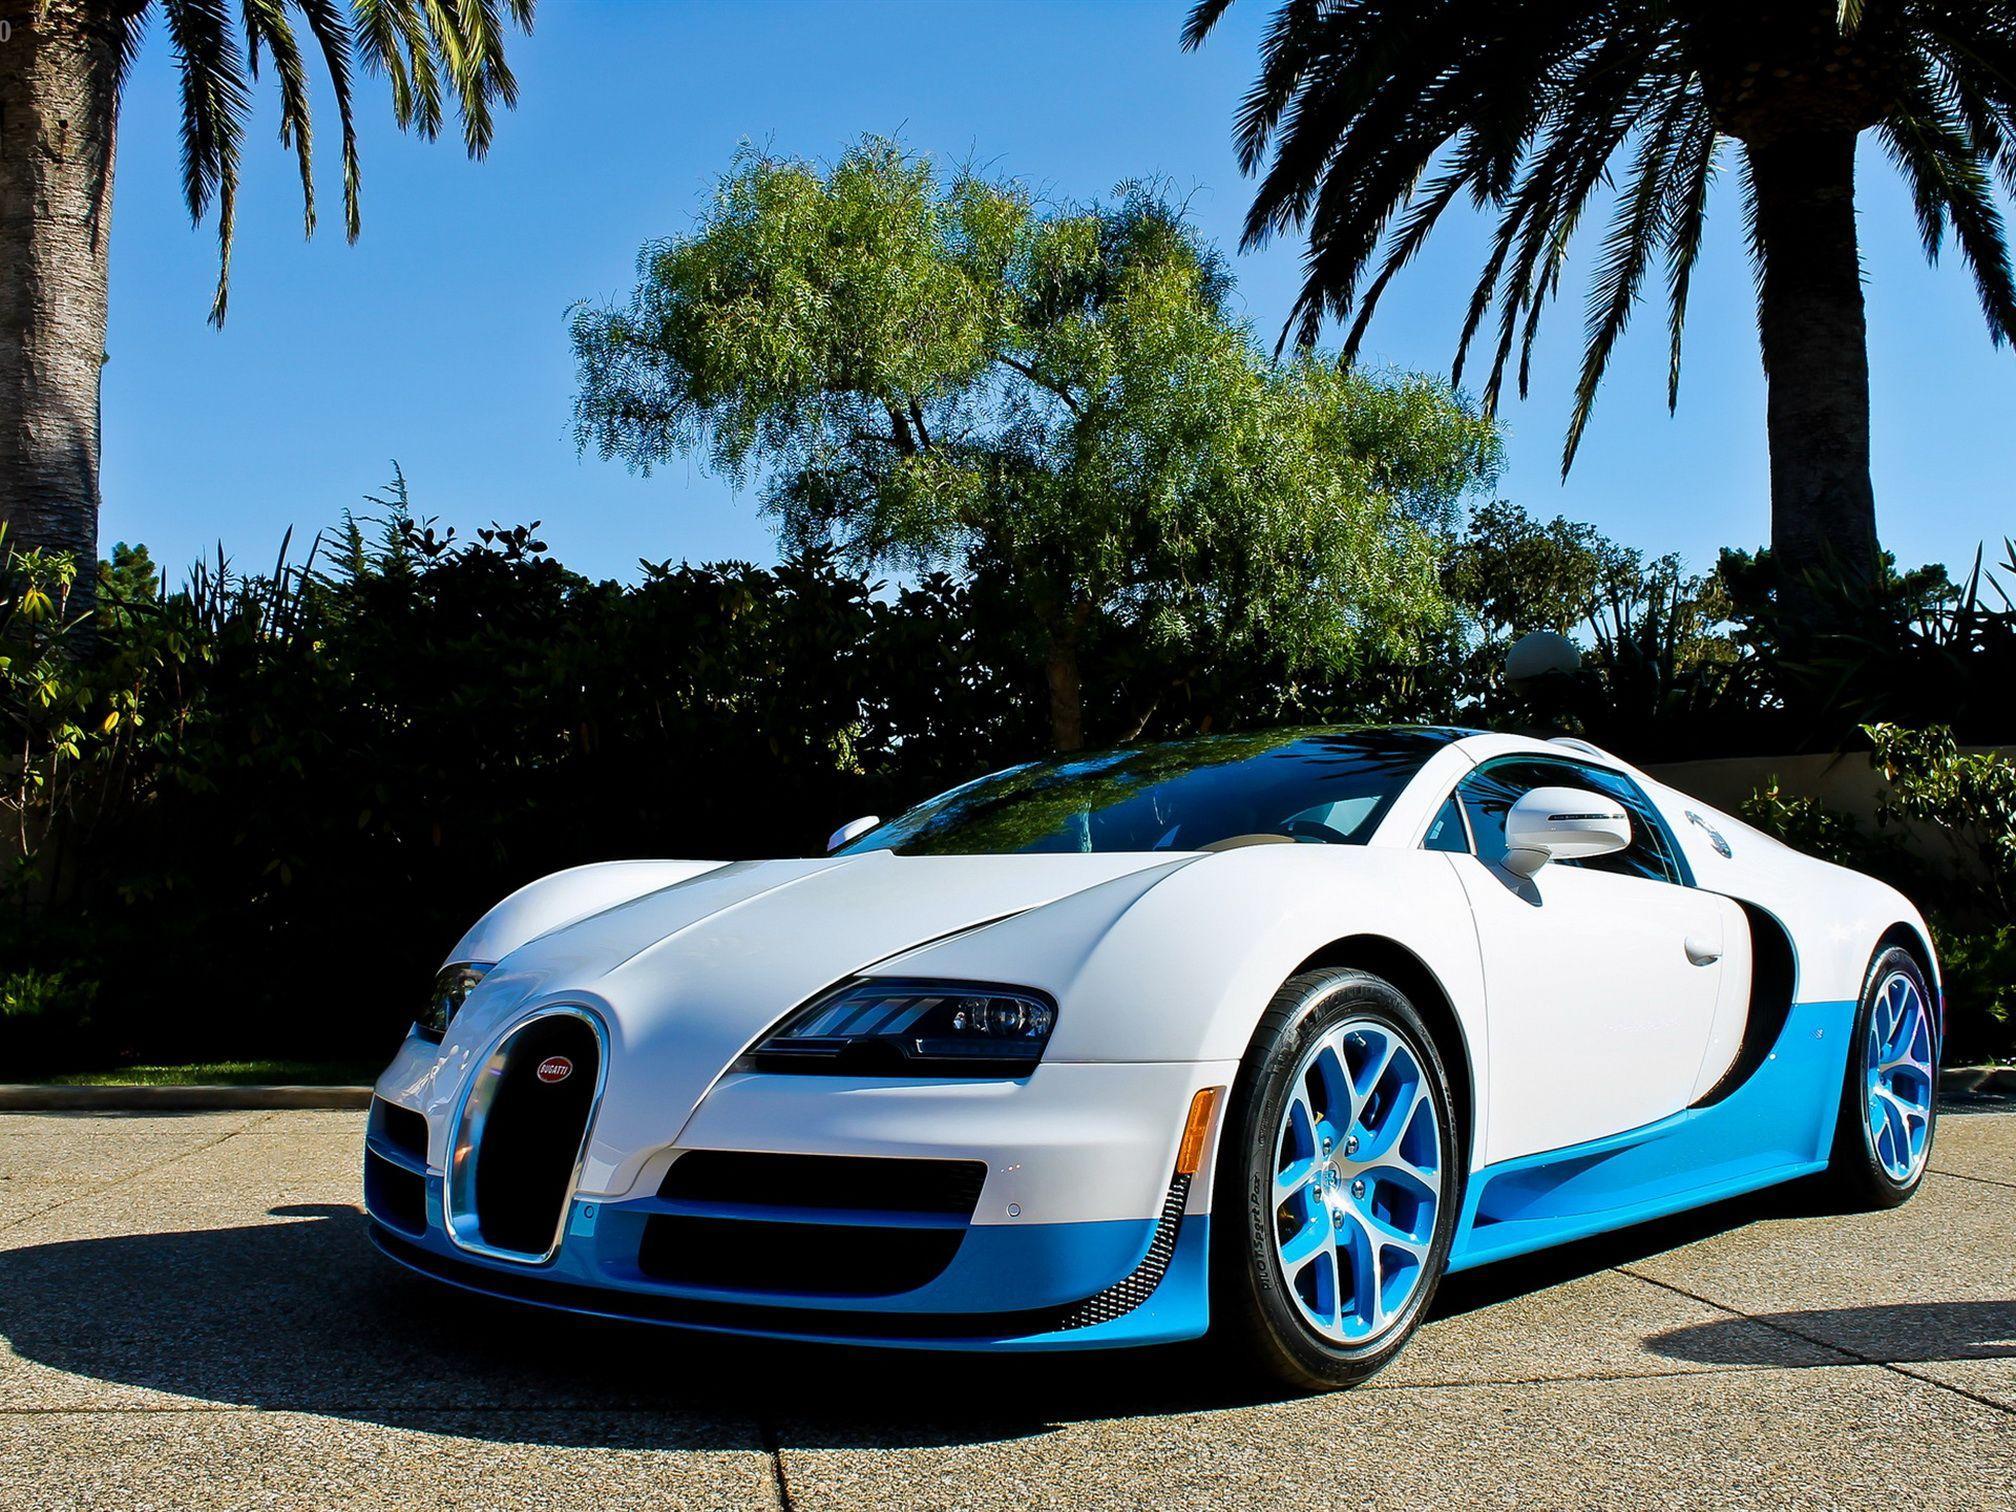 Blue Bugatti Veyron Super Sport Wallpaper: Blue Bugatti Veyron Wallpapers